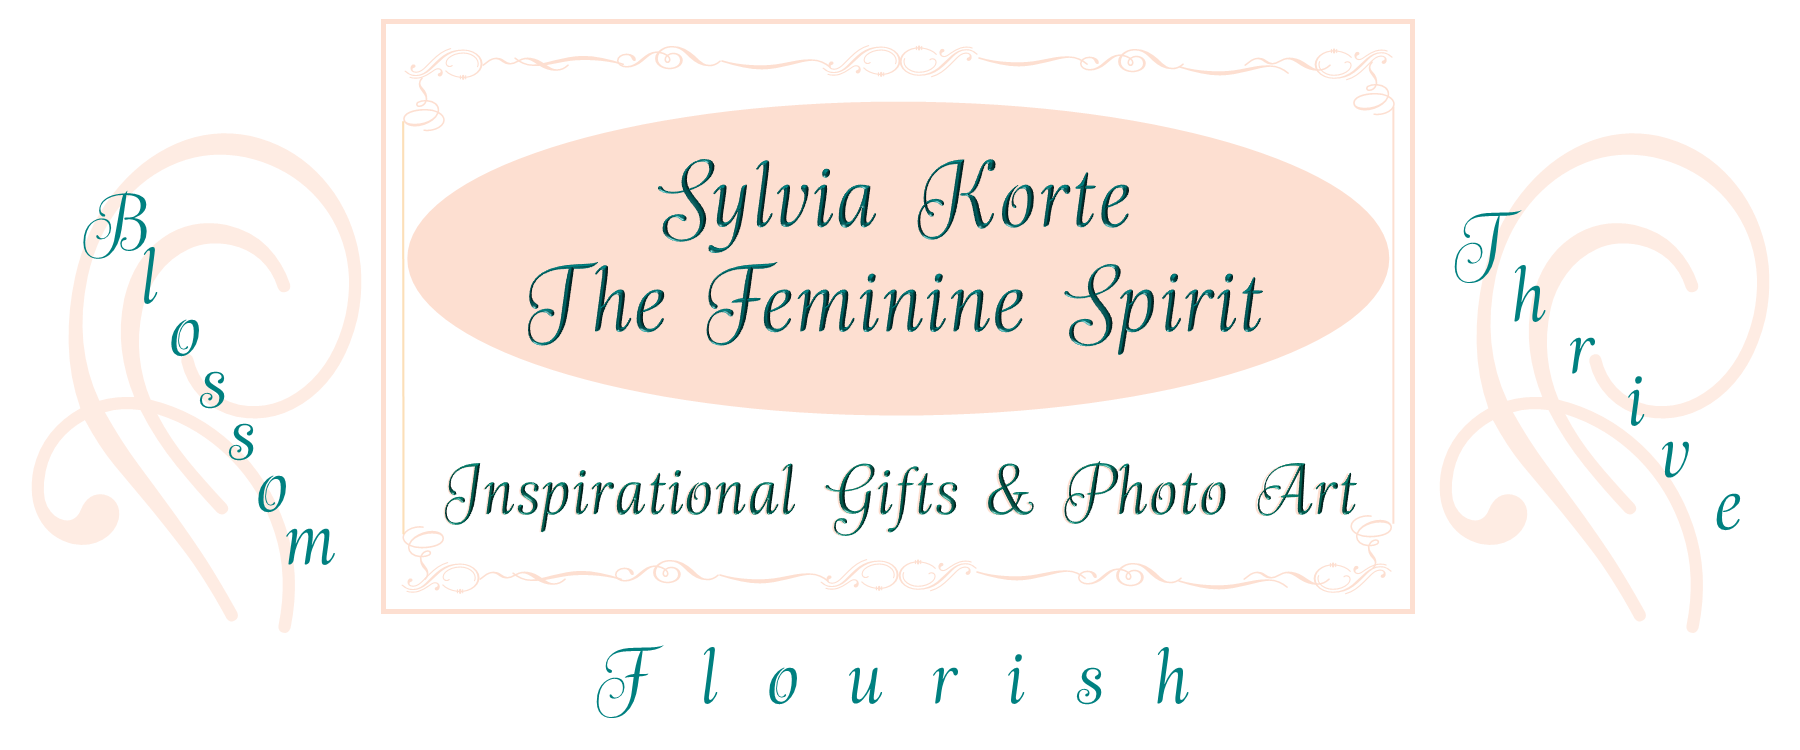 Sylvia Korte ~ The Feminine Spirit